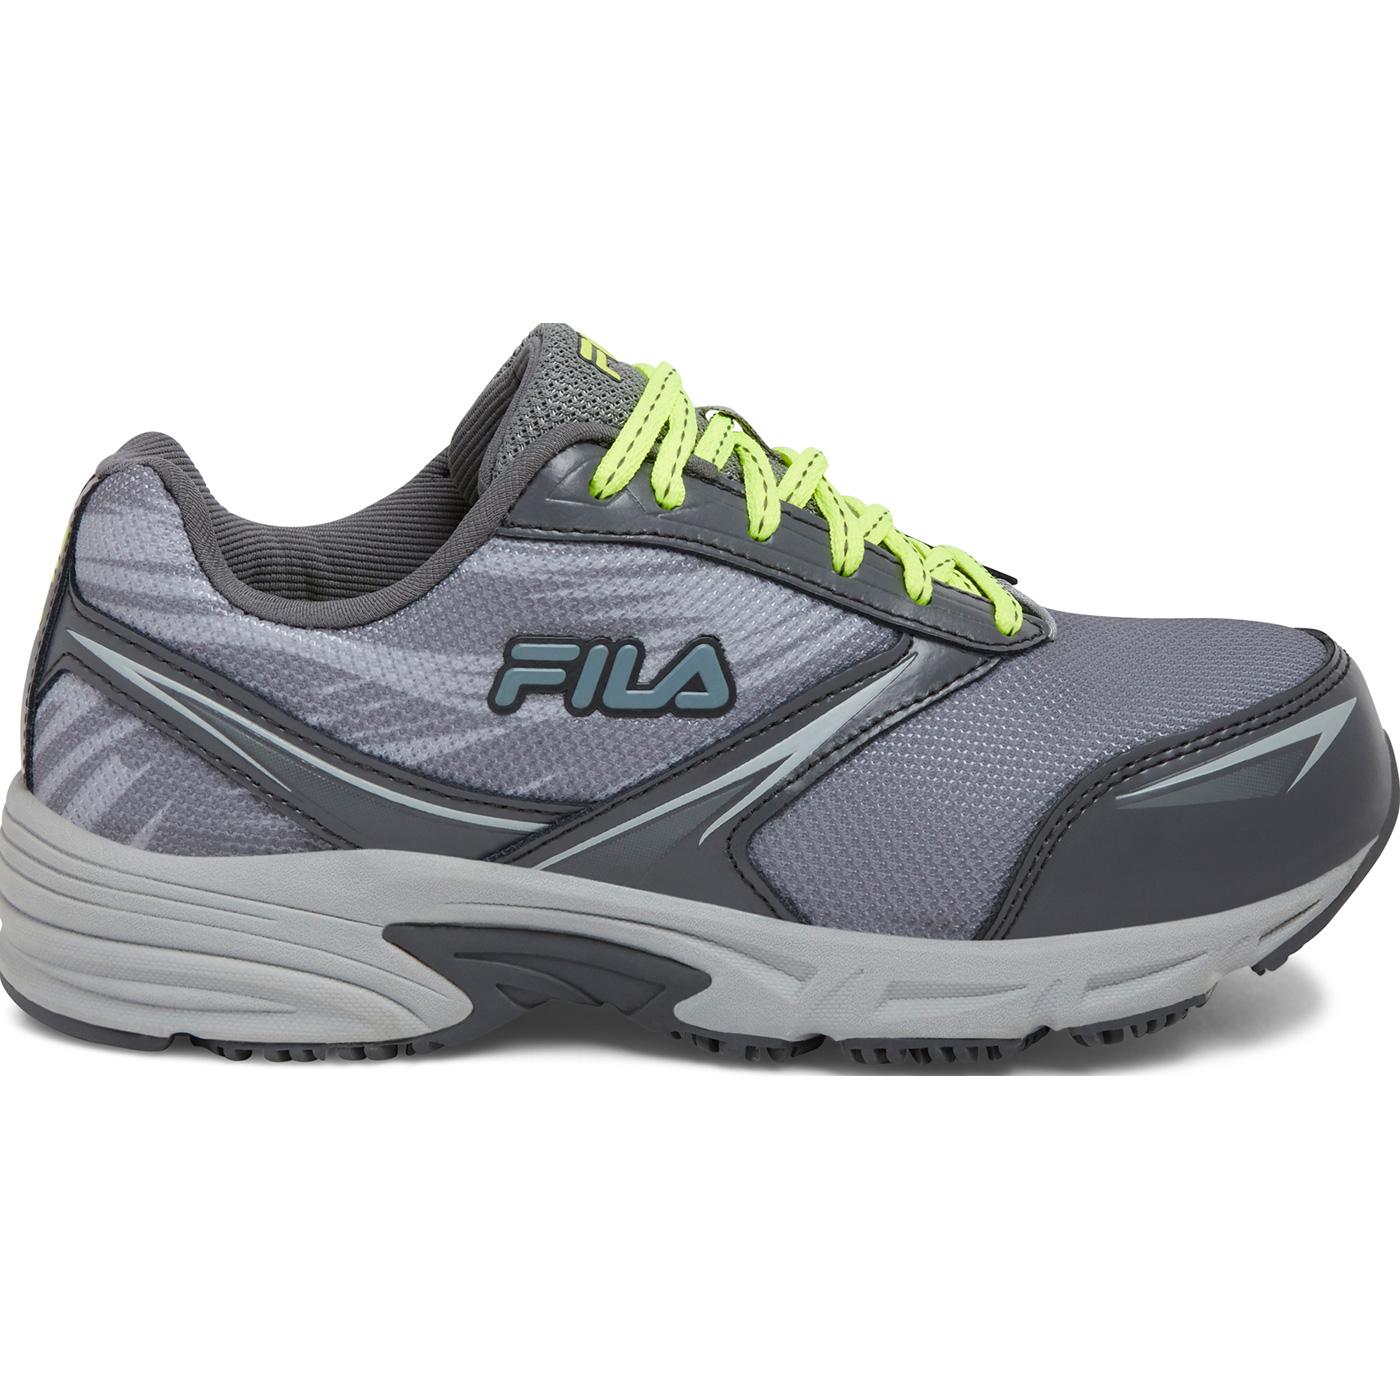 FILA Memory Meiera 2 Women s Gray Composite Toe Work Athletic Shoe ... 44304776038